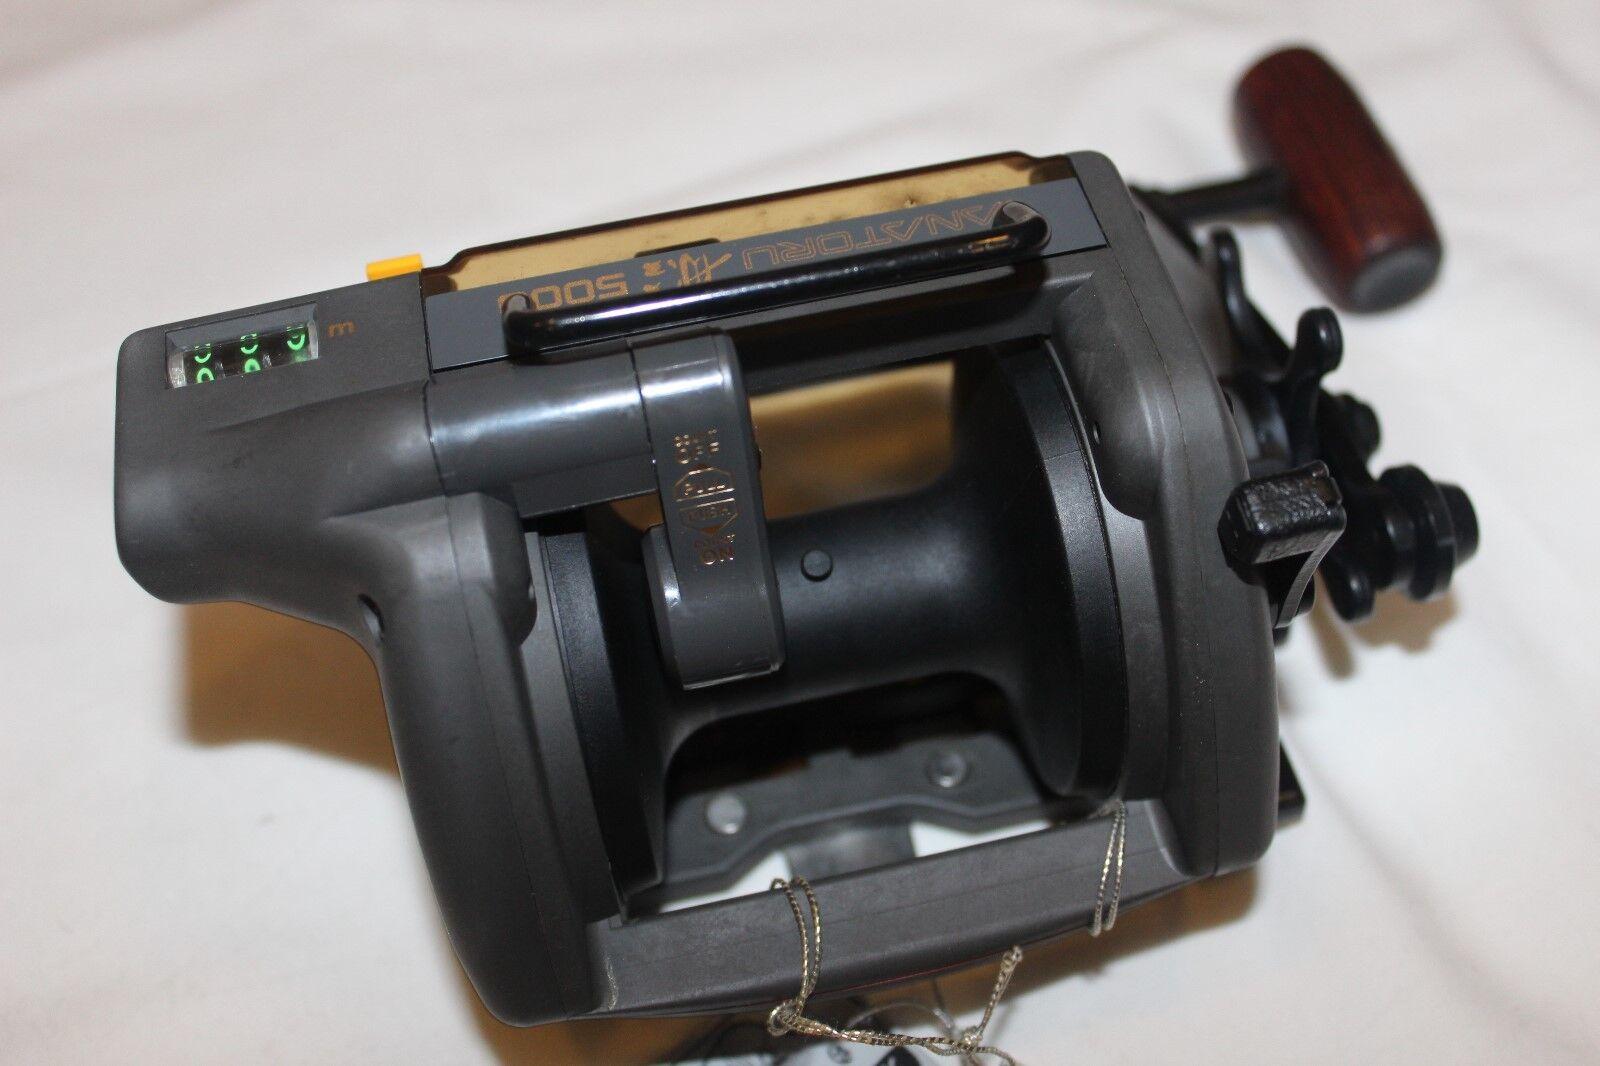 SHIMANO TITANOS-TANATORU  OVP-MADE GT-5000-NEU IM OVP-MADE  IN  JAPAN -Nr 778 59c3fb